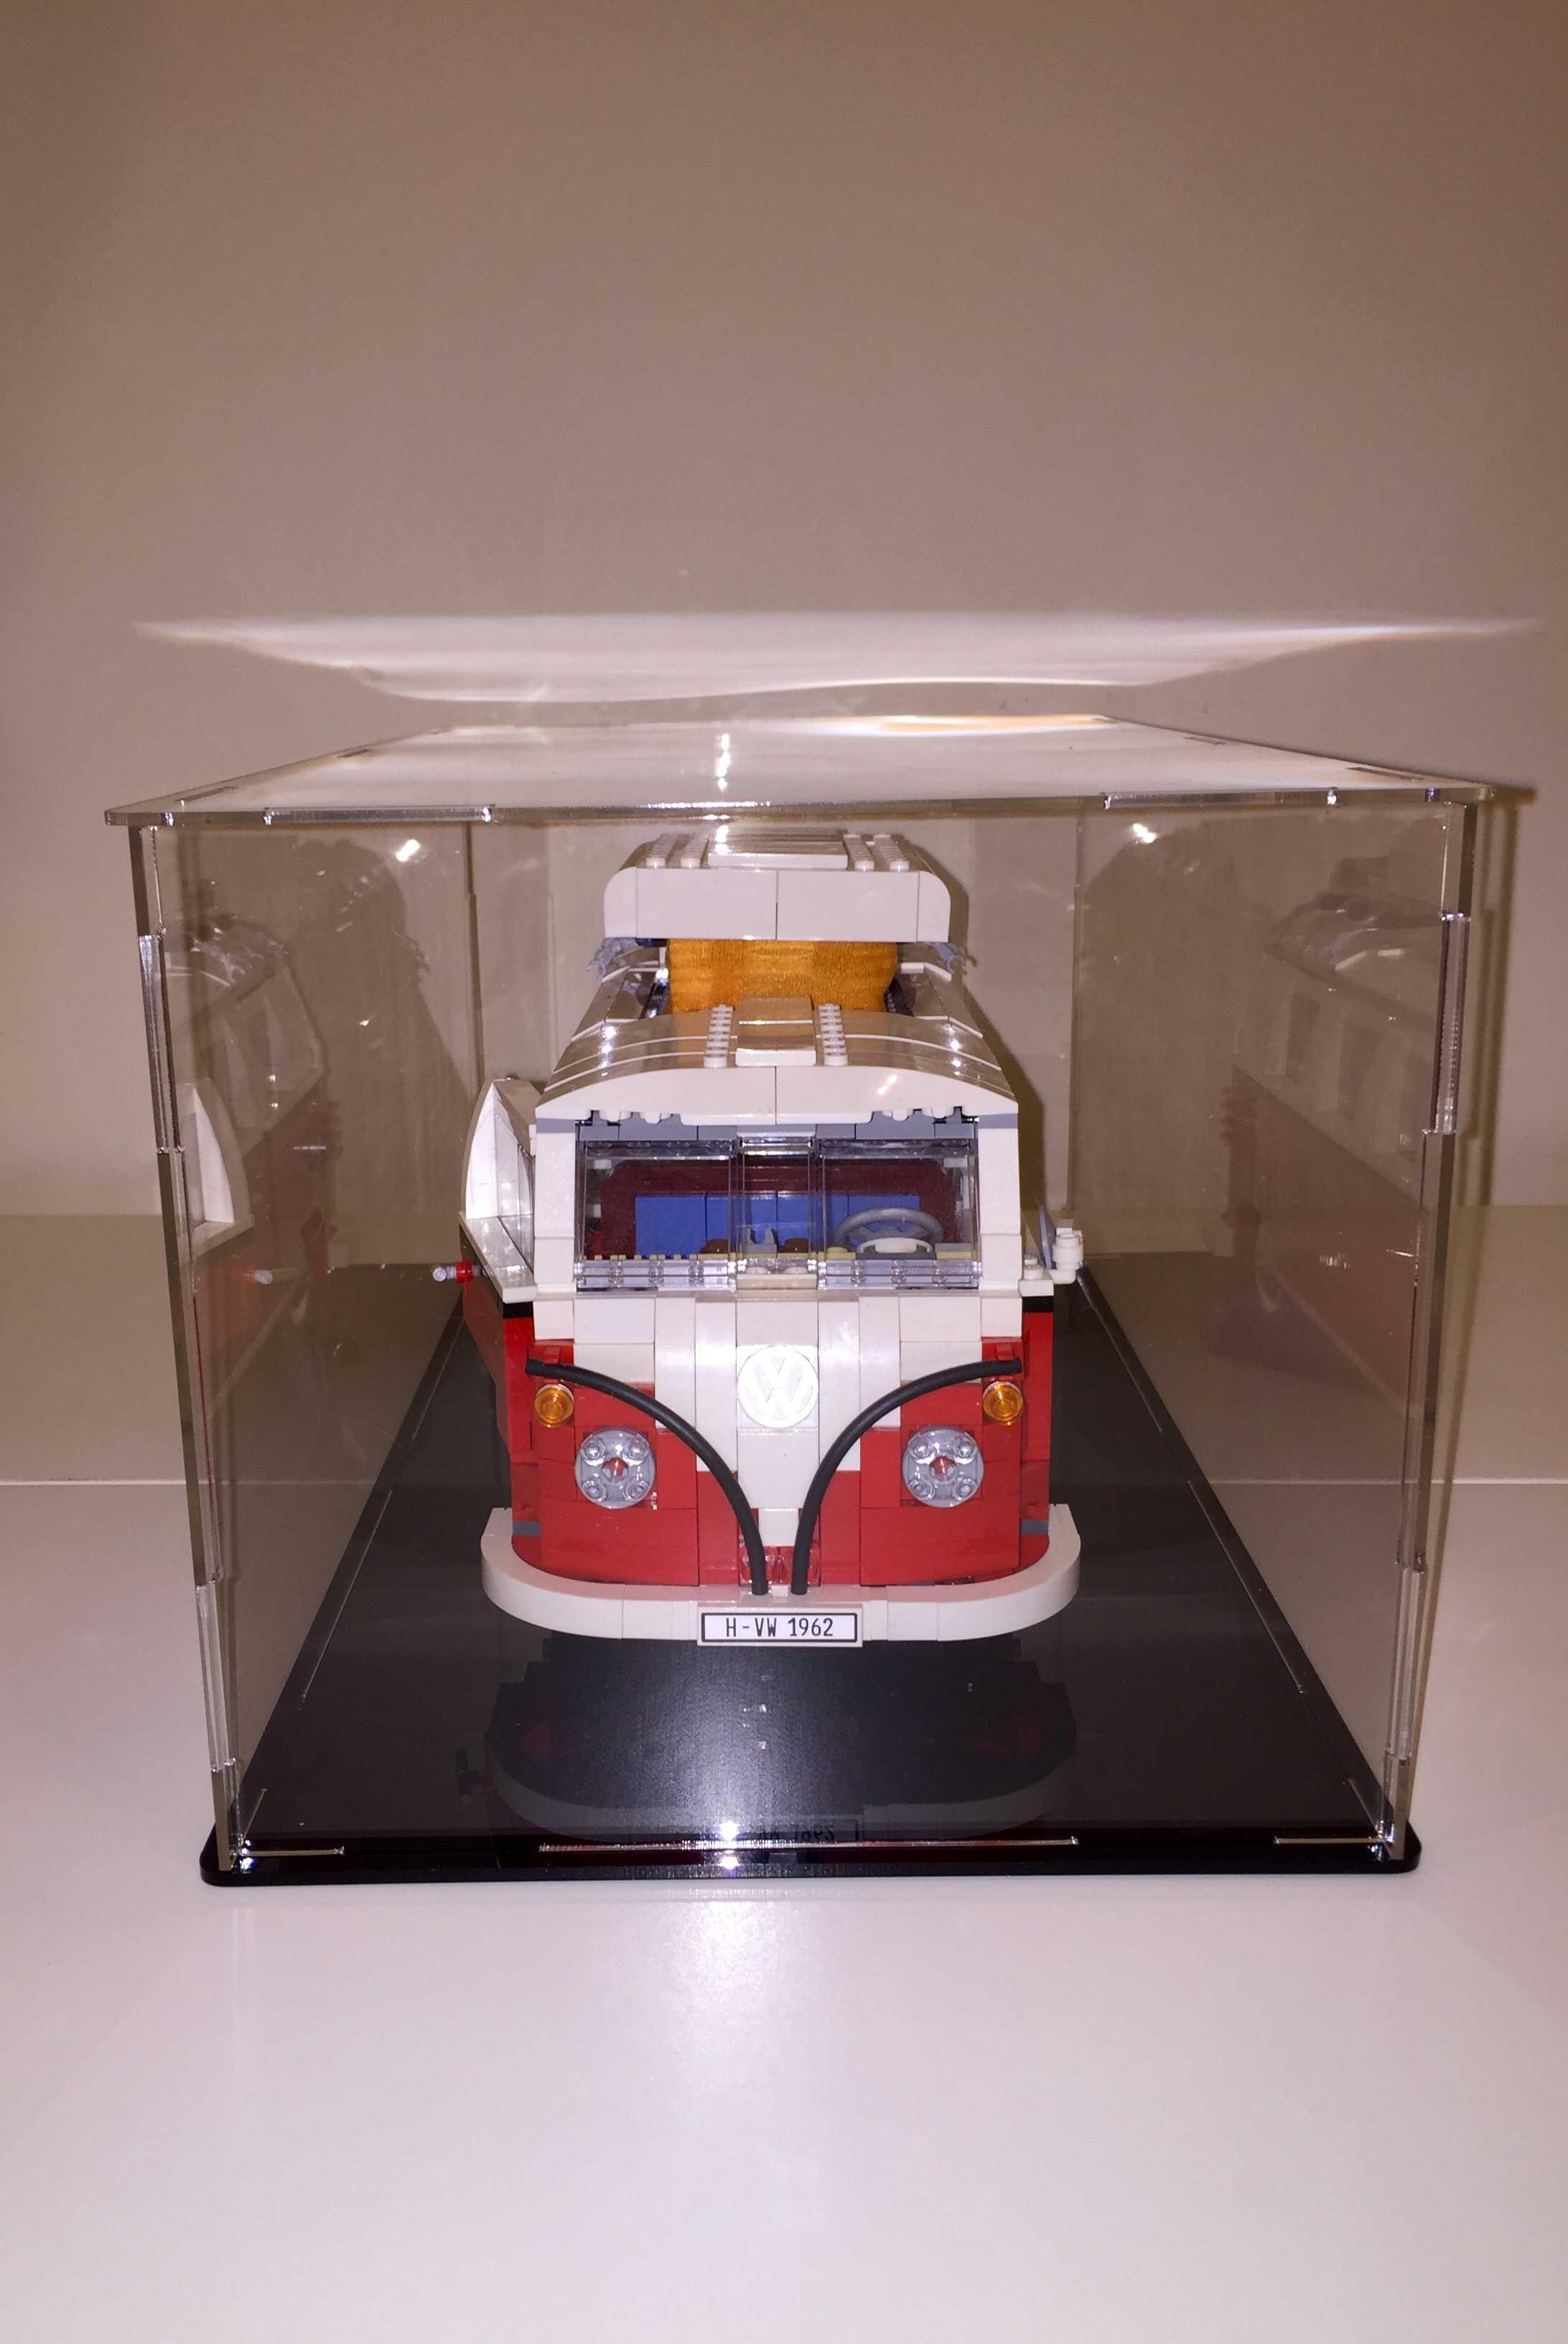 Custom Made LEGO Volkswagen T1 Camper Van (10220) Model Display Box by Gg Brick Shop on Brick ...